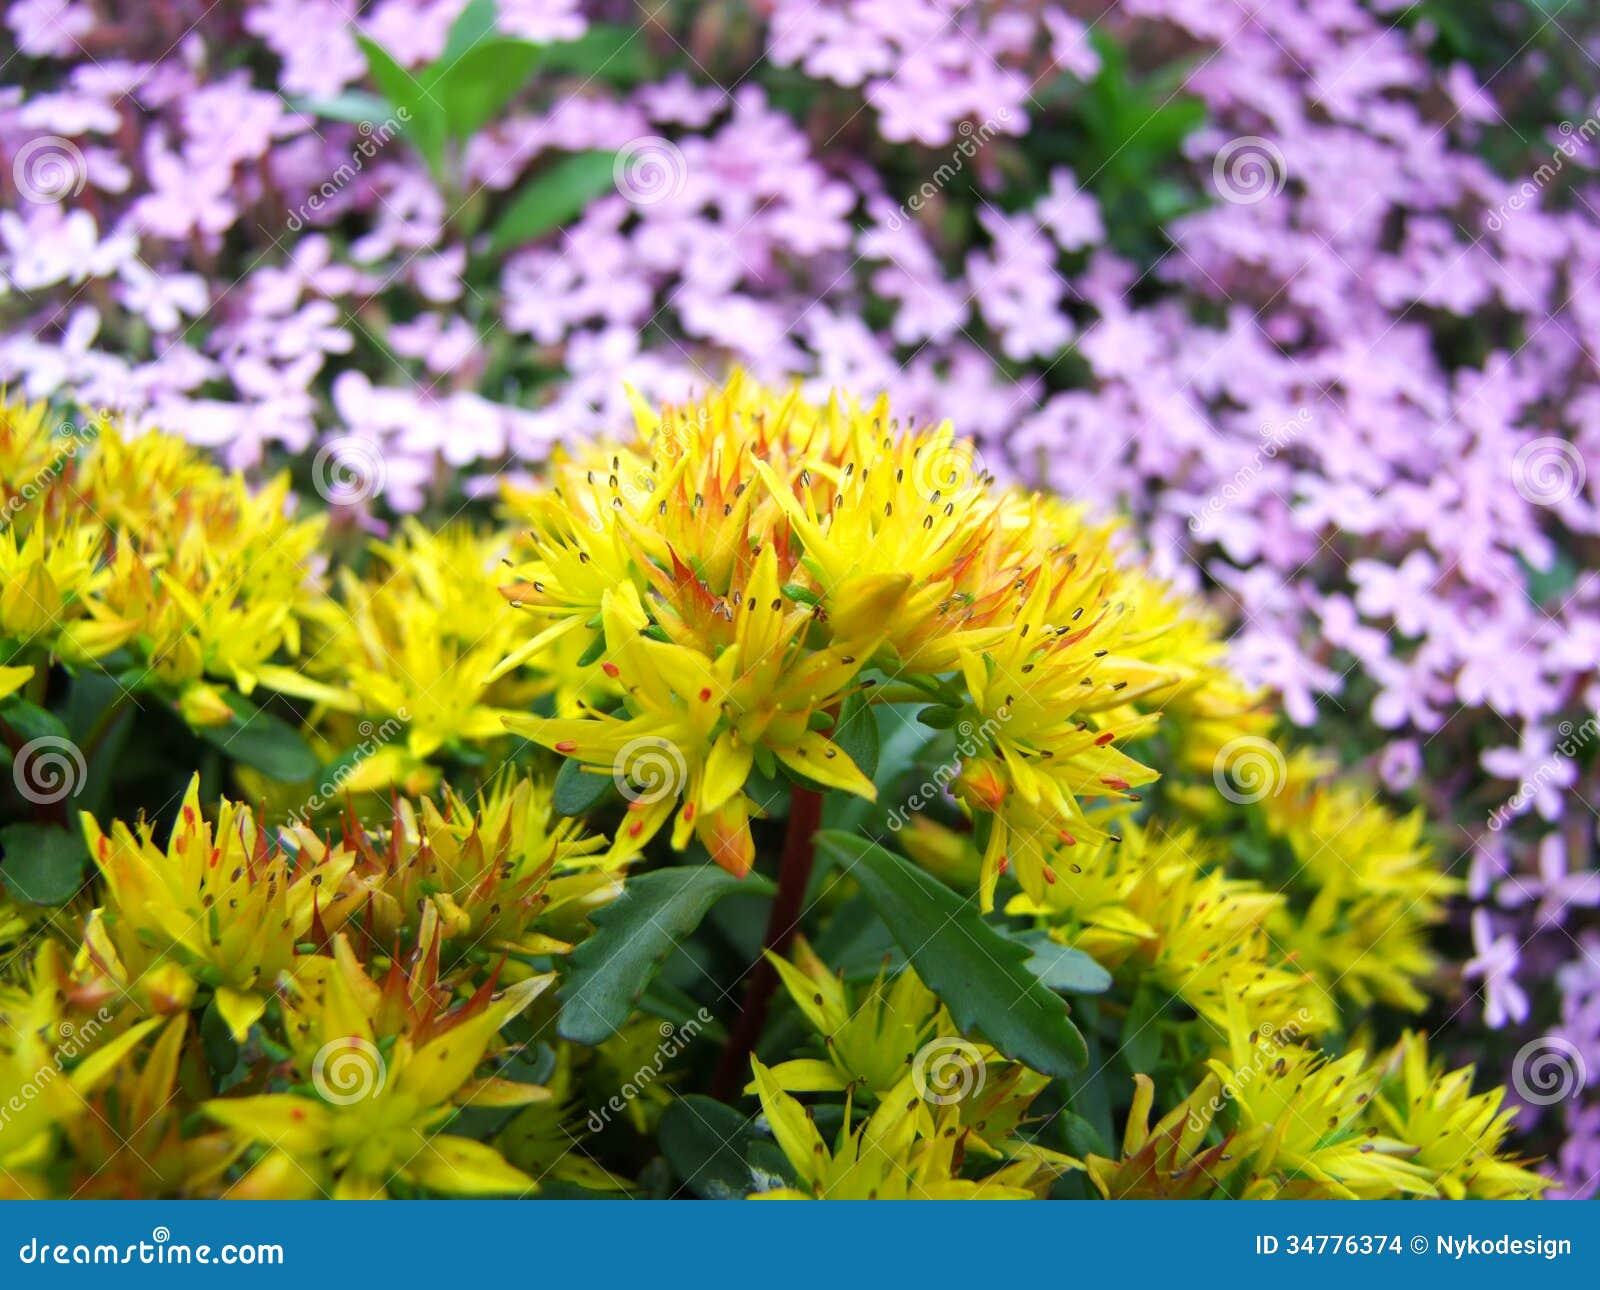 Yellow flowers stock photo image of garden spiky plant 34776374 yellow flowers mightylinksfo